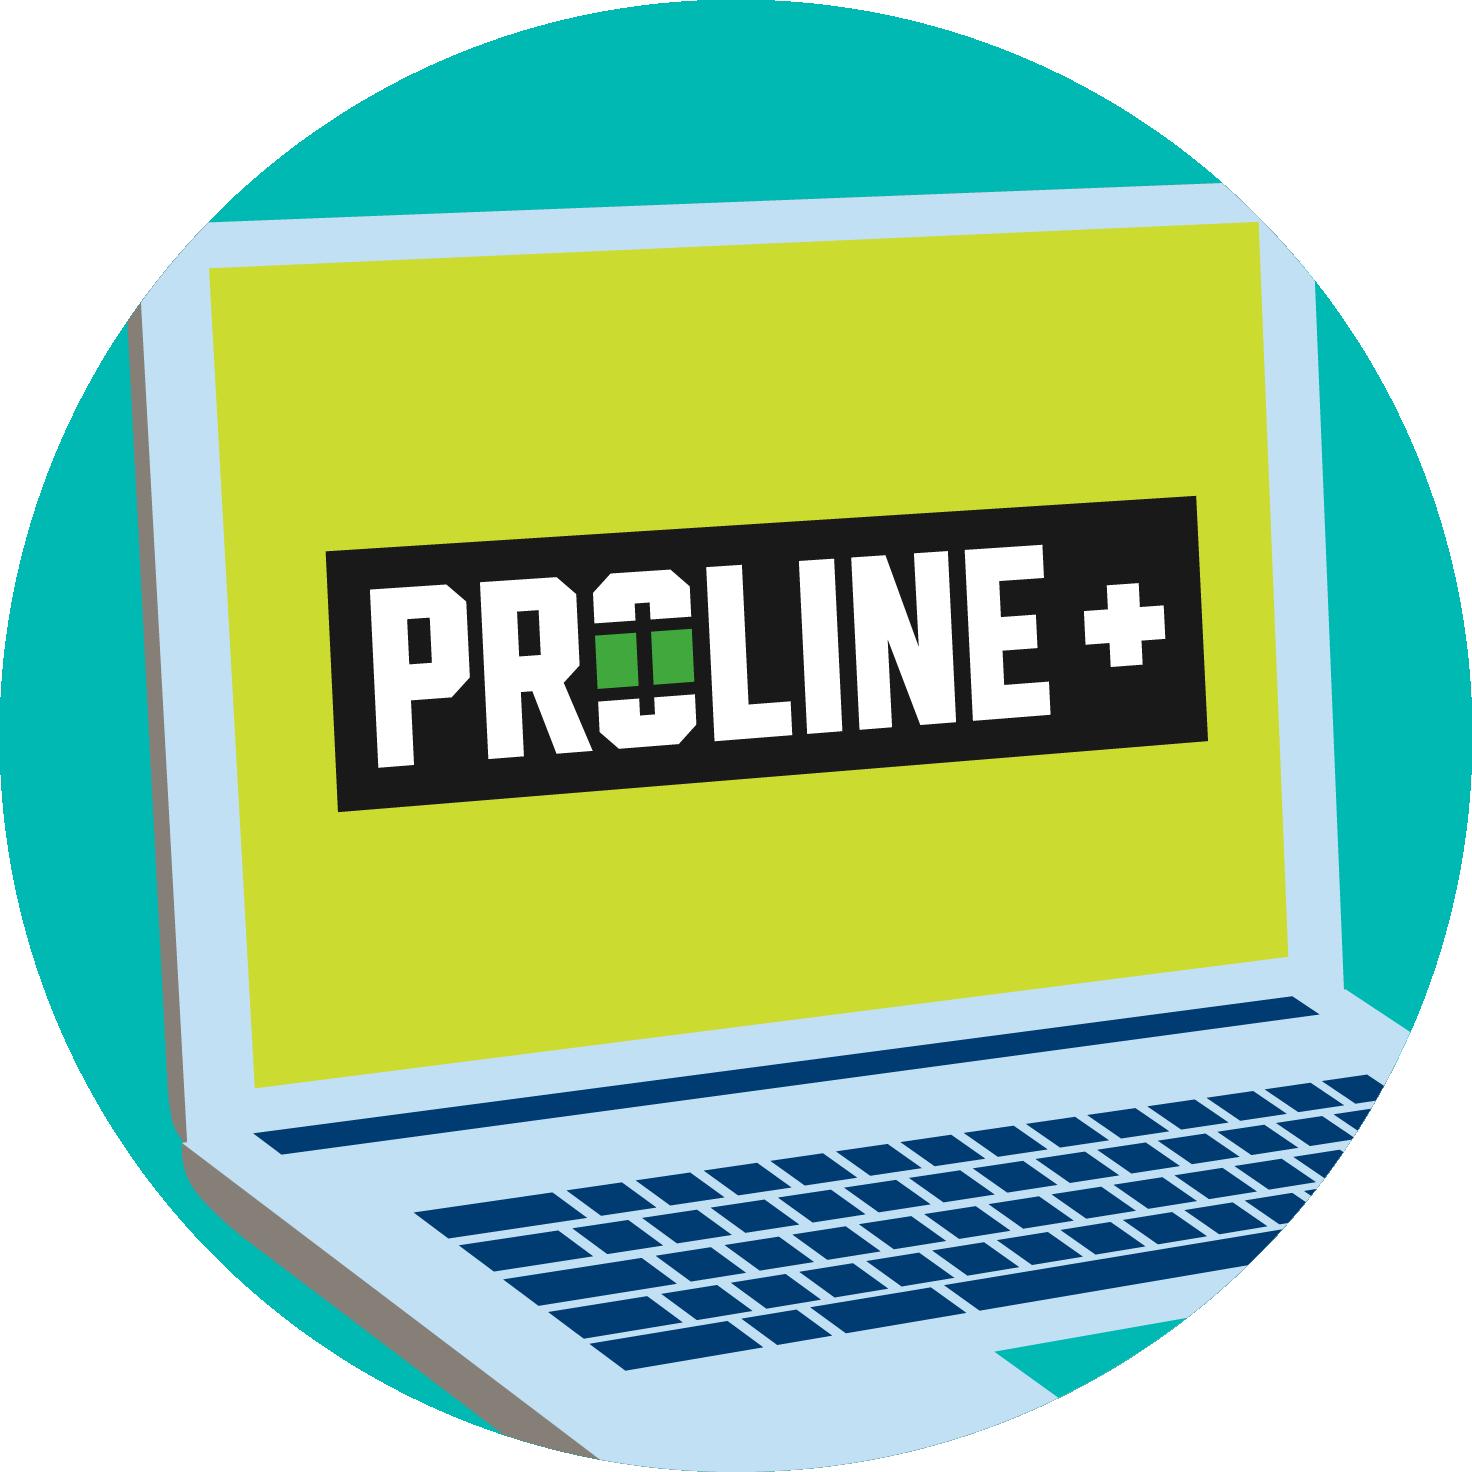 A laptop screen displays the PROLINE+ logo